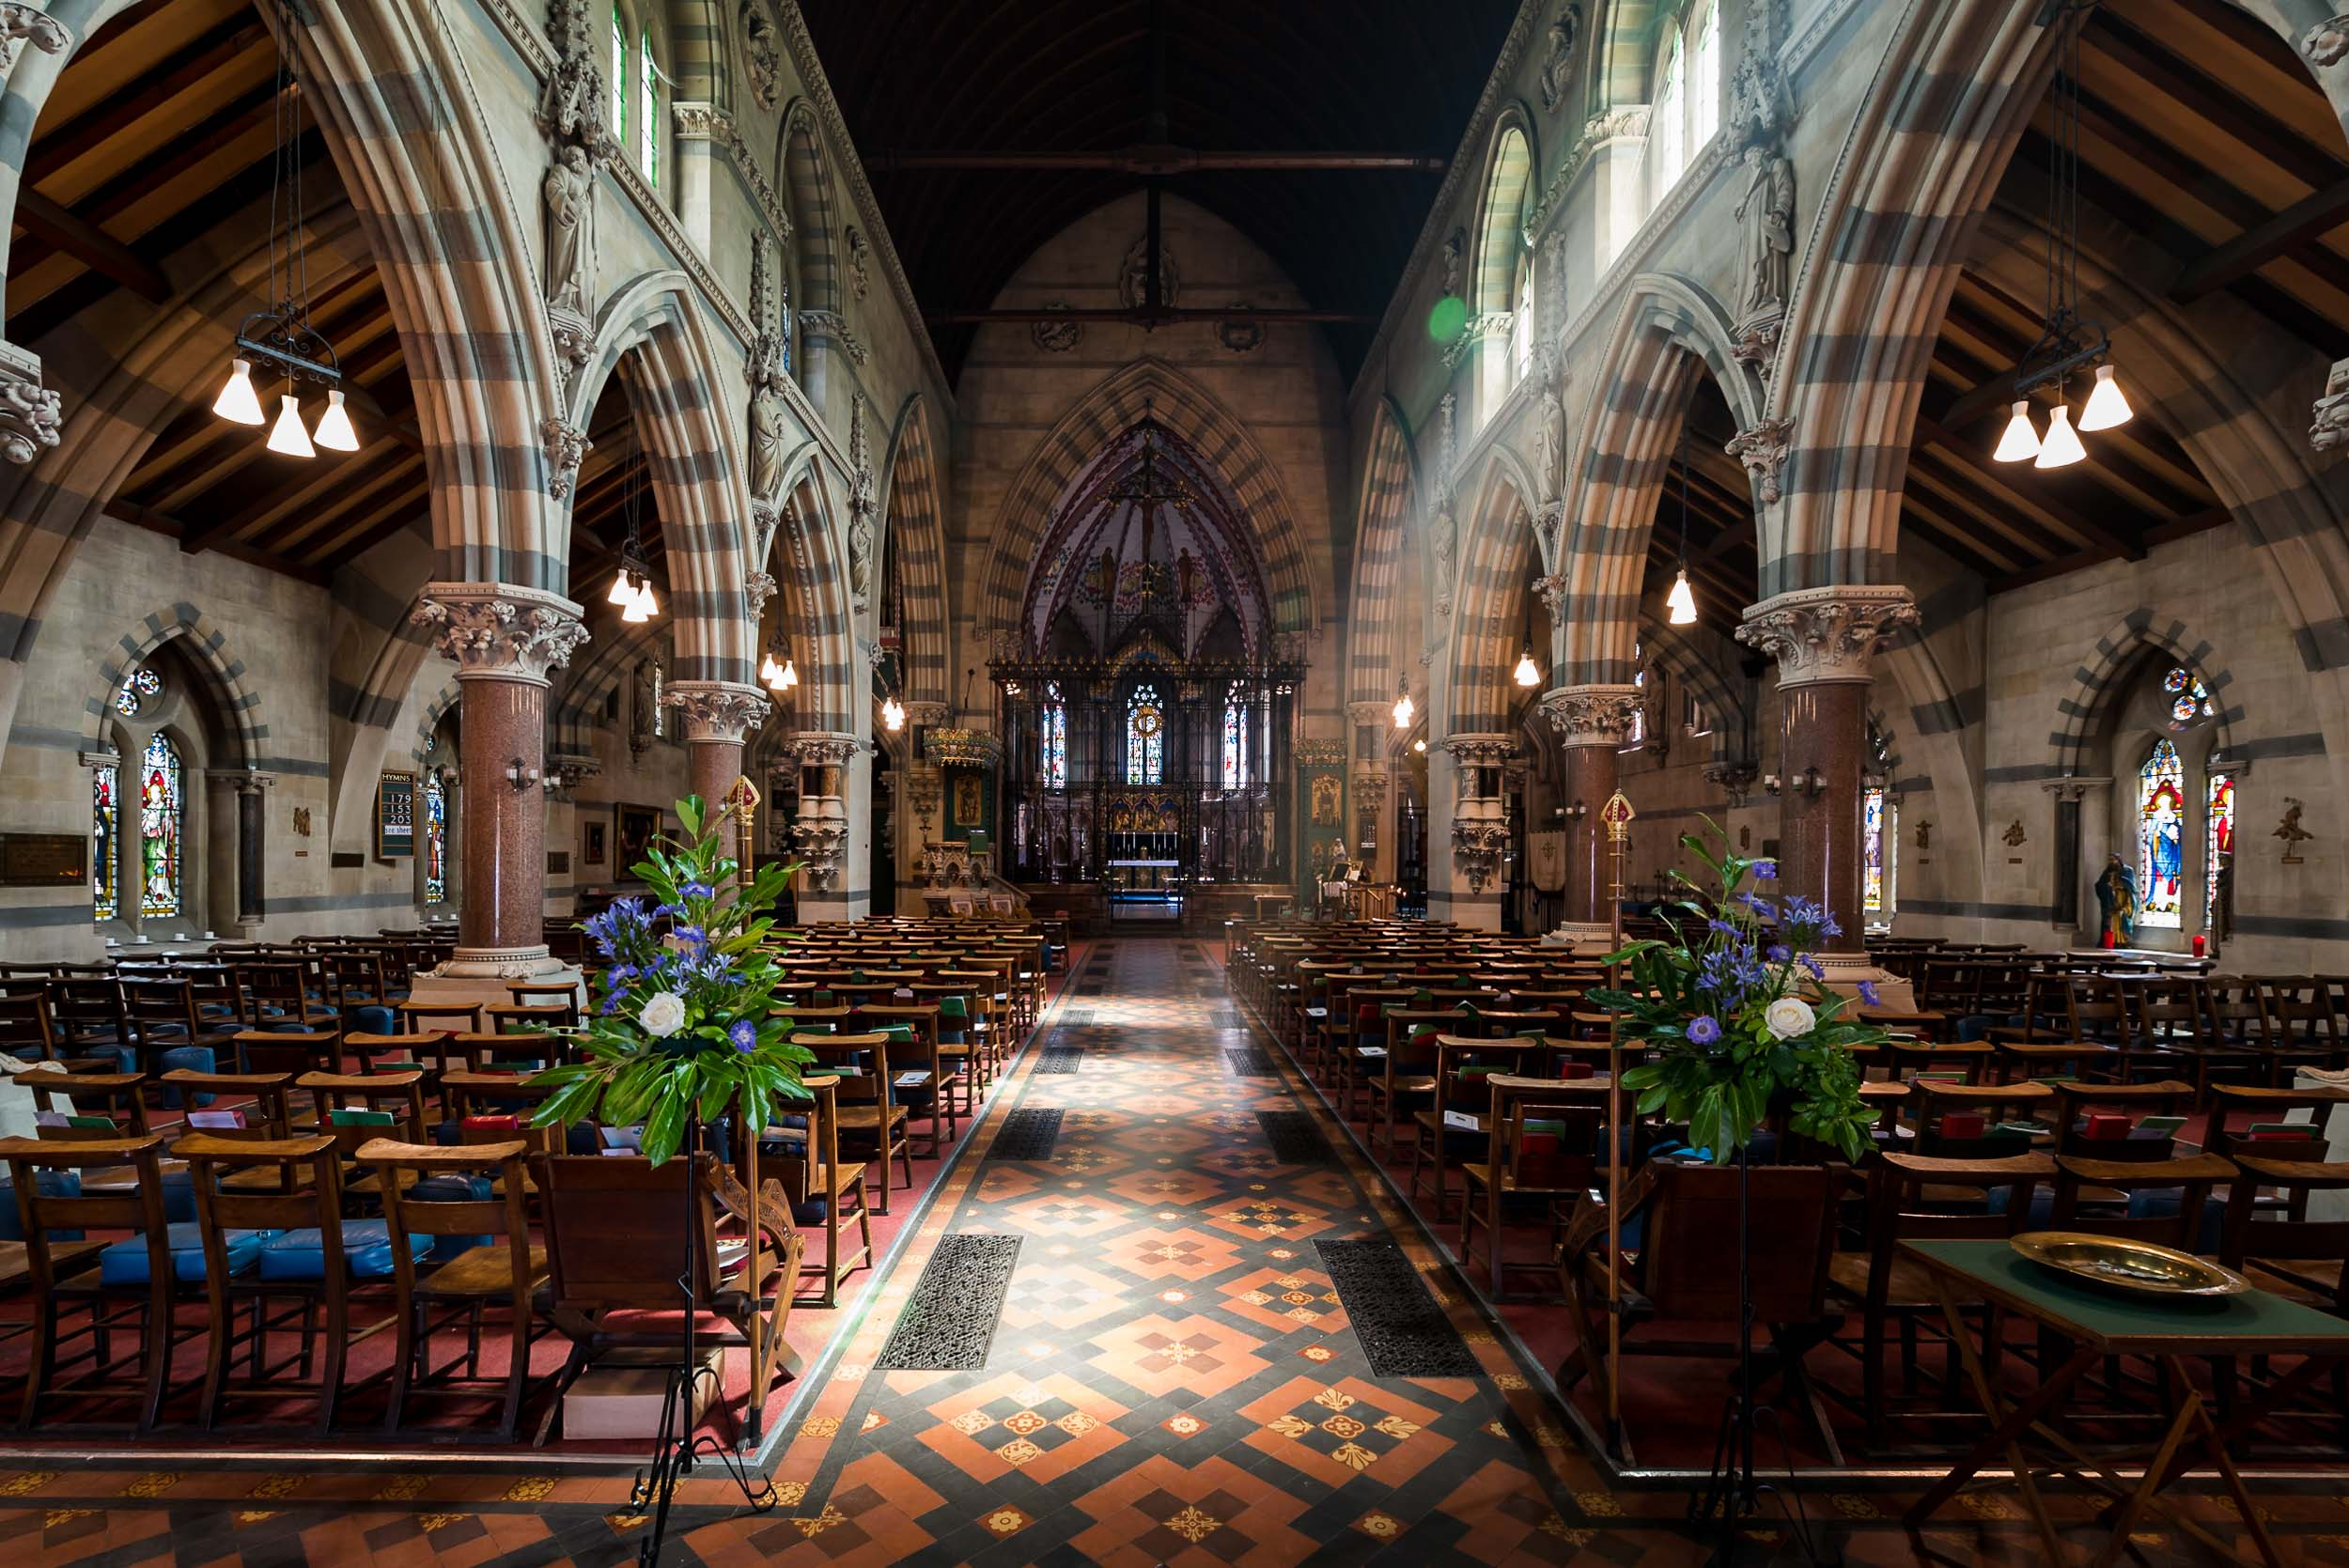 NC-nick-church-photography-architectural-0016.jpg